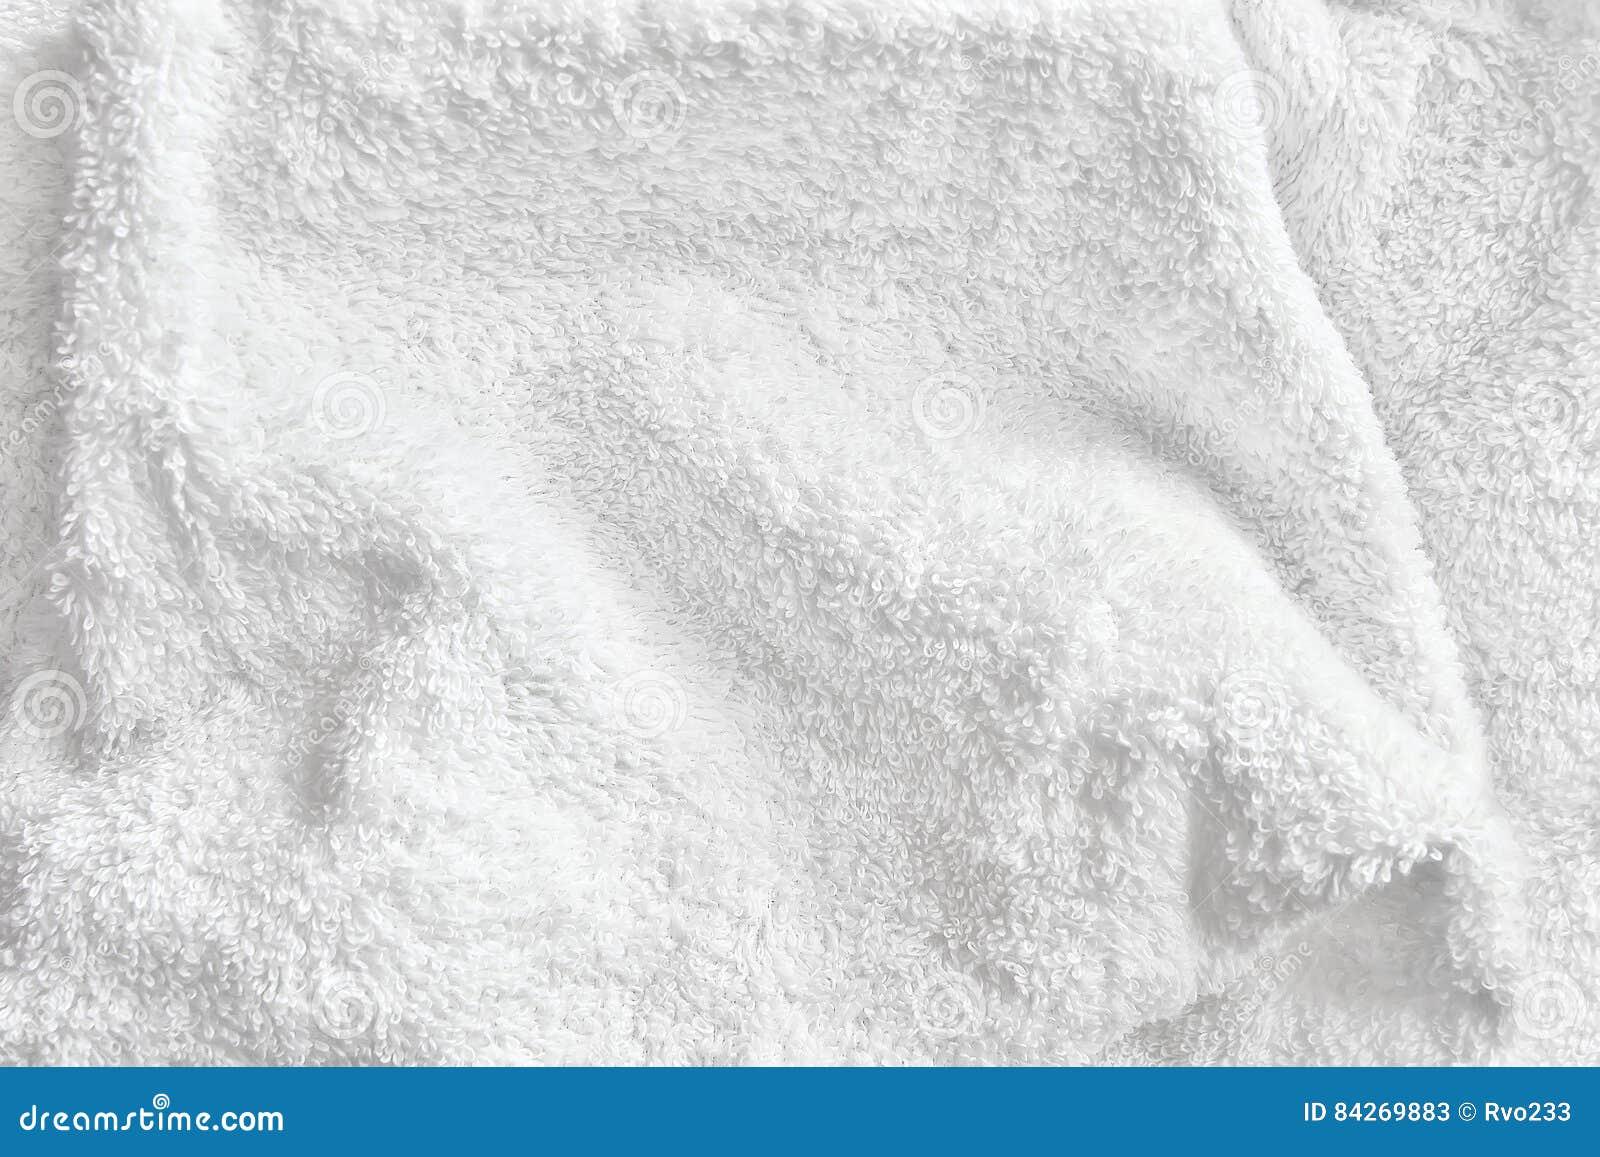 White Cotton Towel Terry Cloth Texture Stock Image - Image: 84269883 for Soft White Cotton Texture  56mzq